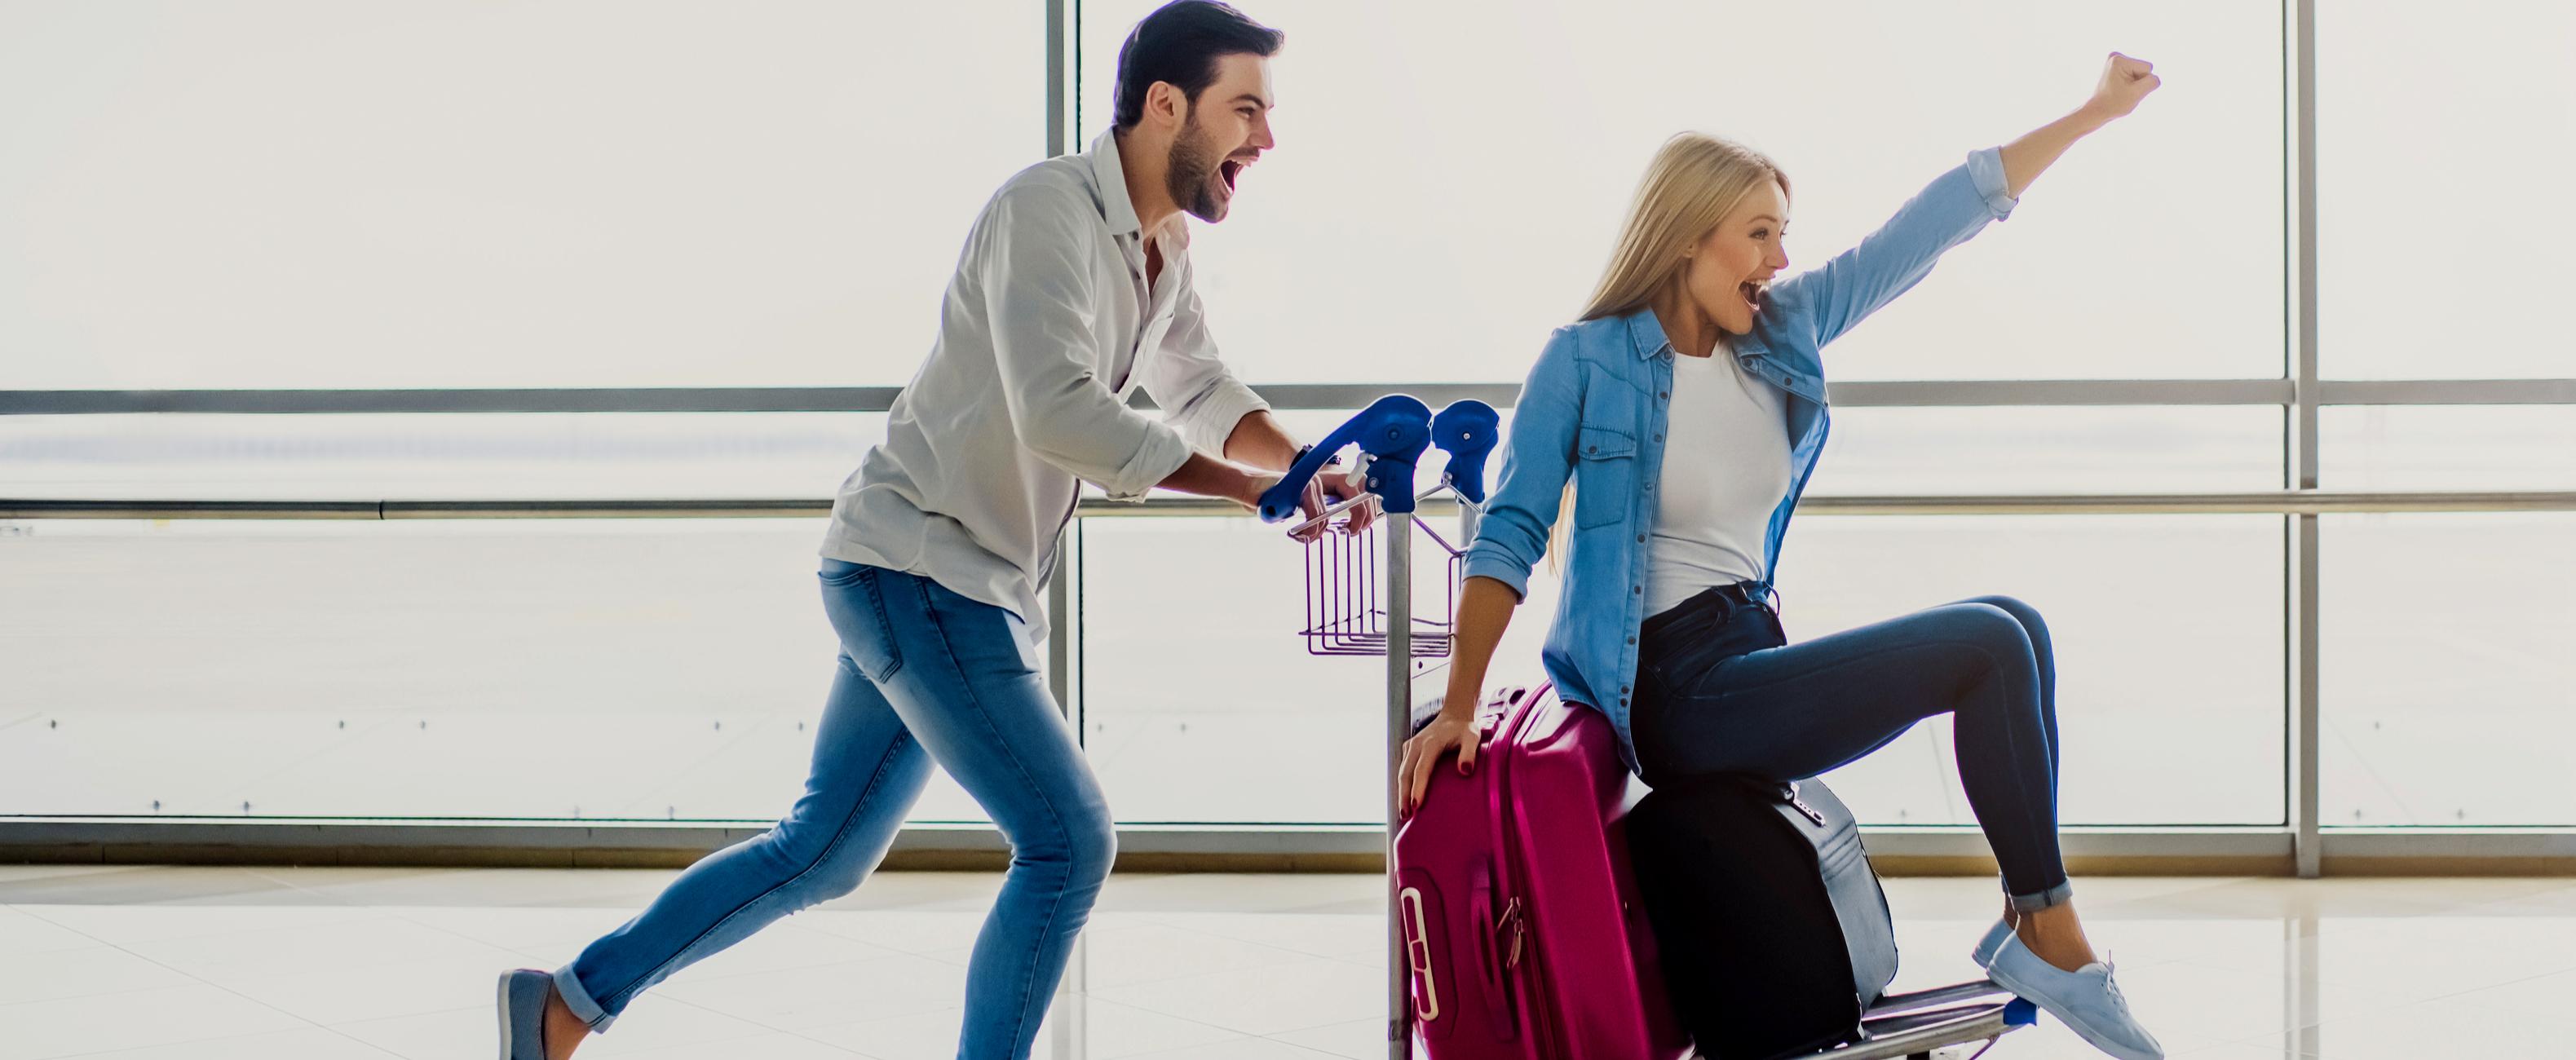 pareja-aeropuerto-banner-completo